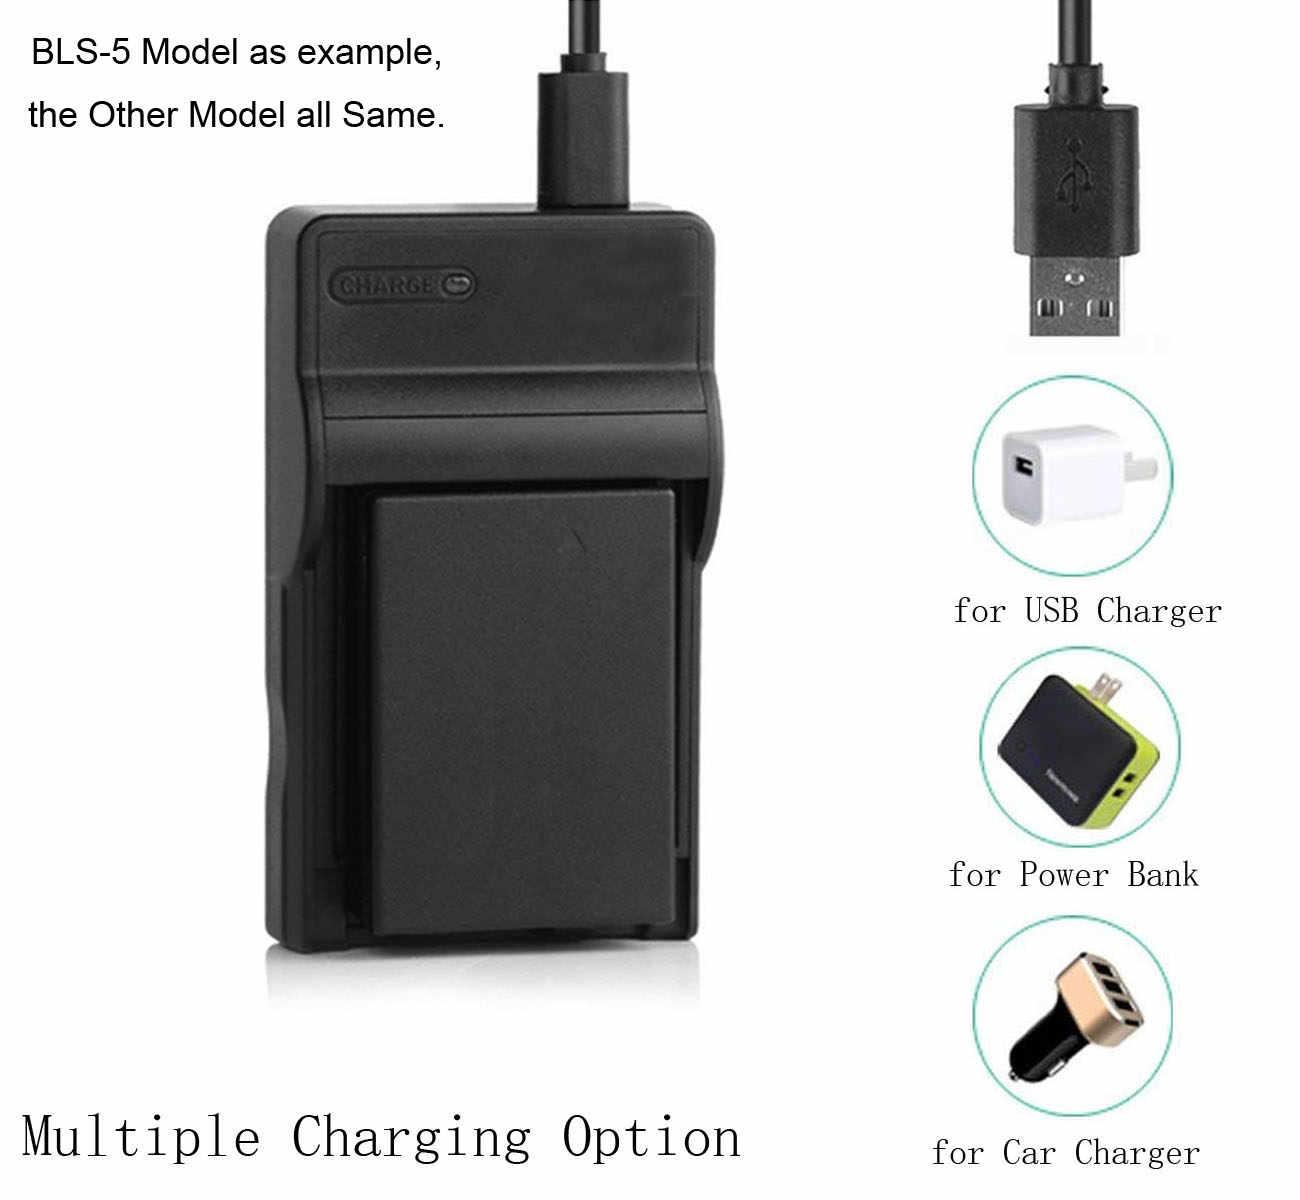 HDC-SD60S SDX1 Ultra Slim USB Battery Charger for Panasonic VW-BC10E HDC-SD60K